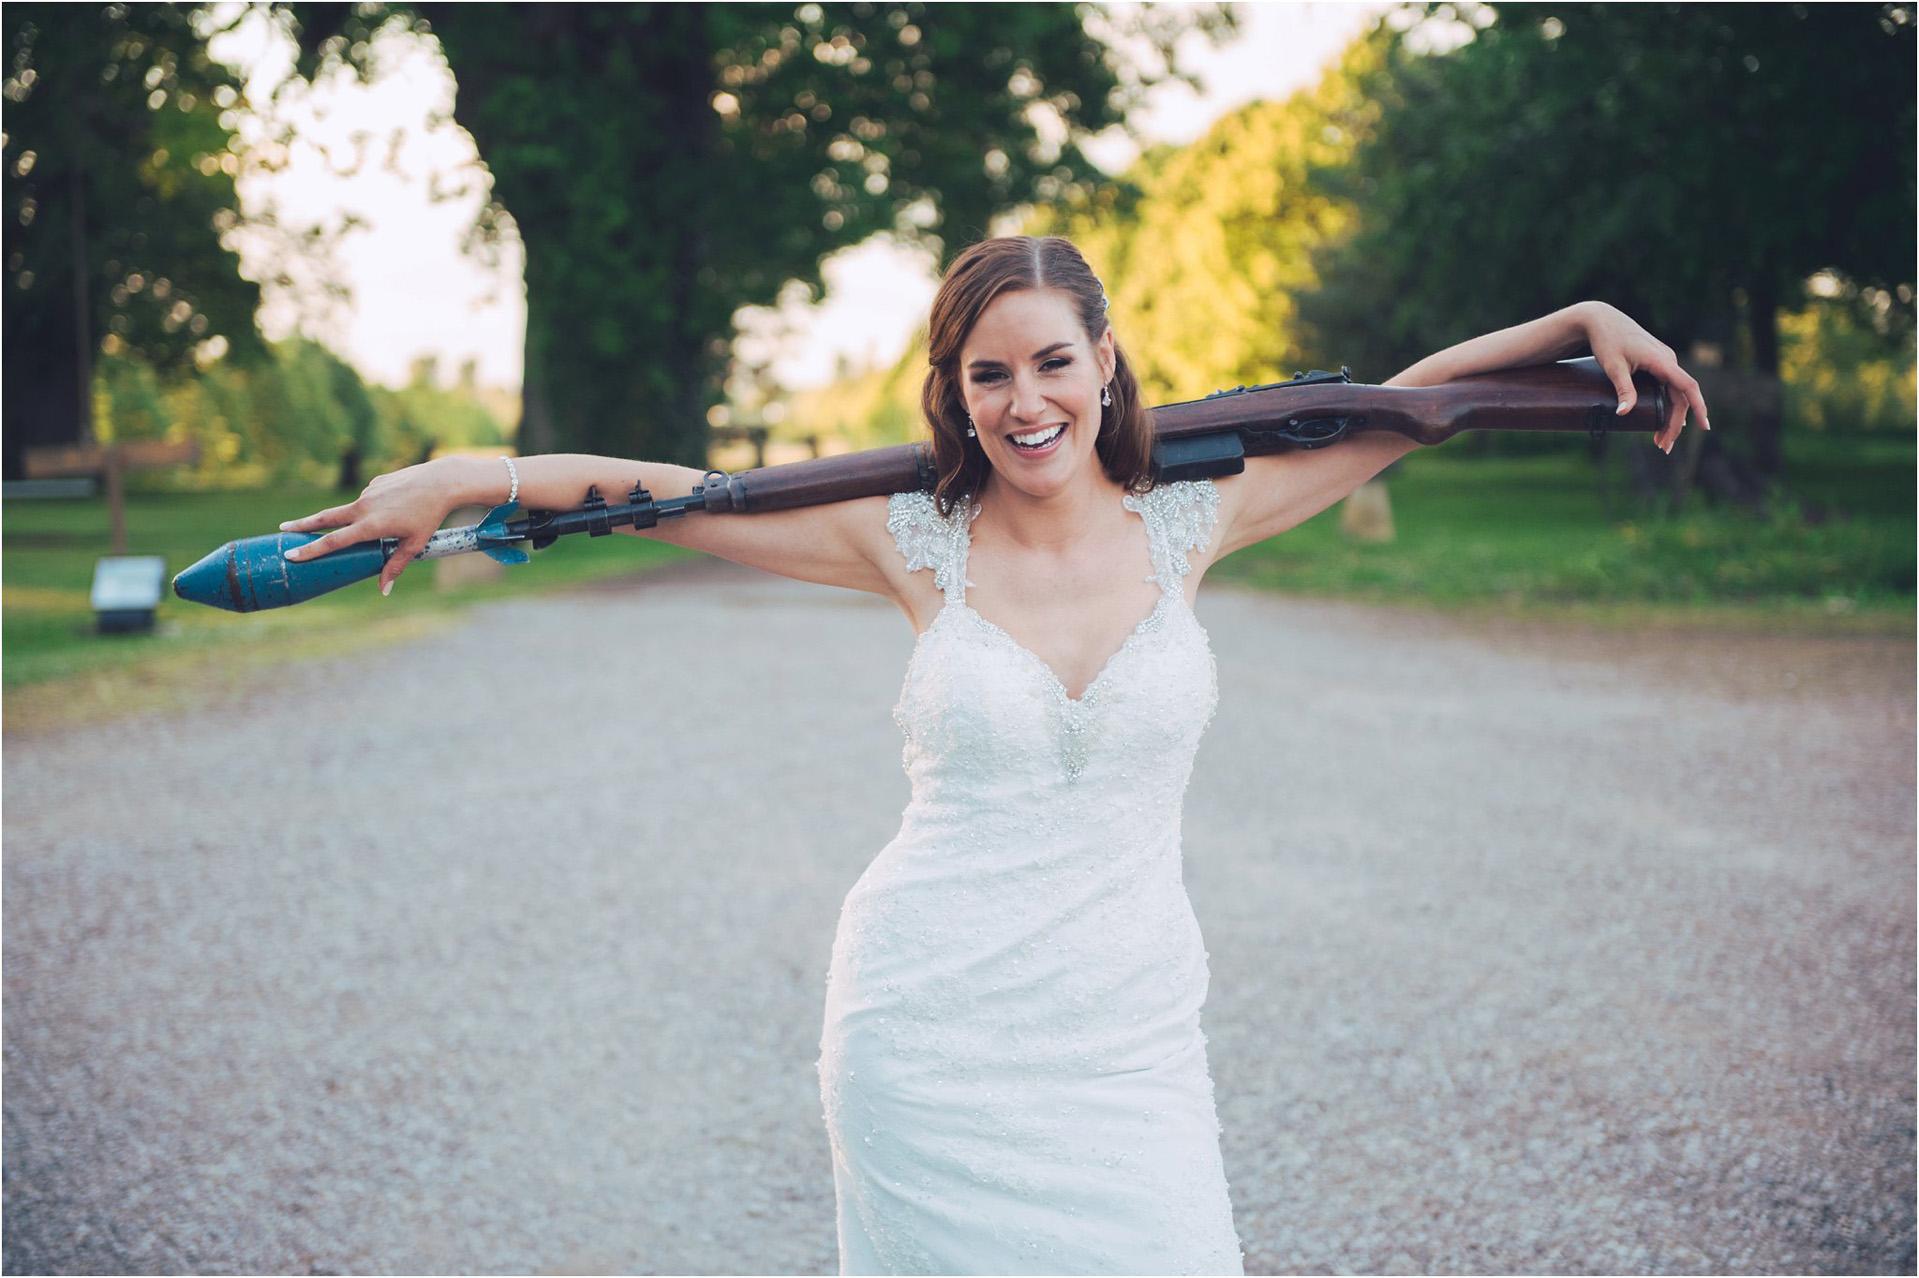 Simon biffen wedding photography 0151